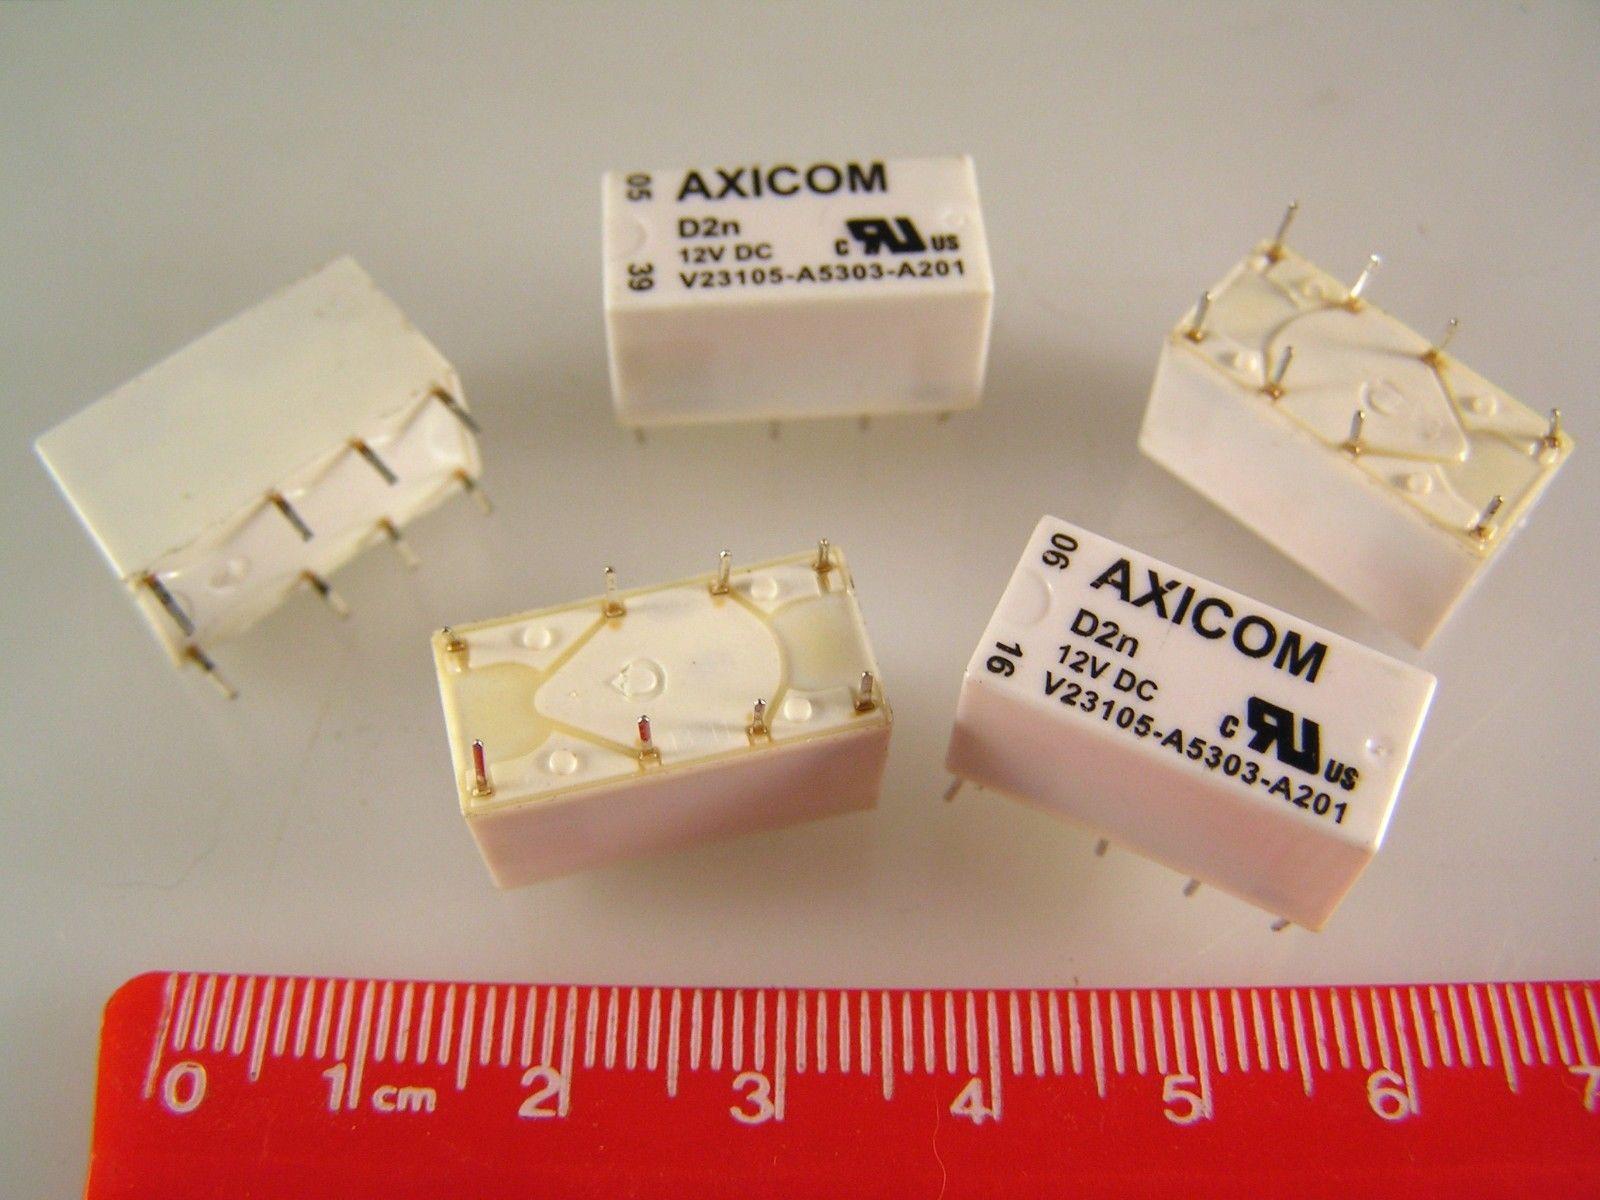 Genuine Axicom V23105 A5303 A201 Signal Relay Dpdt 12vdc 3a Non Latching